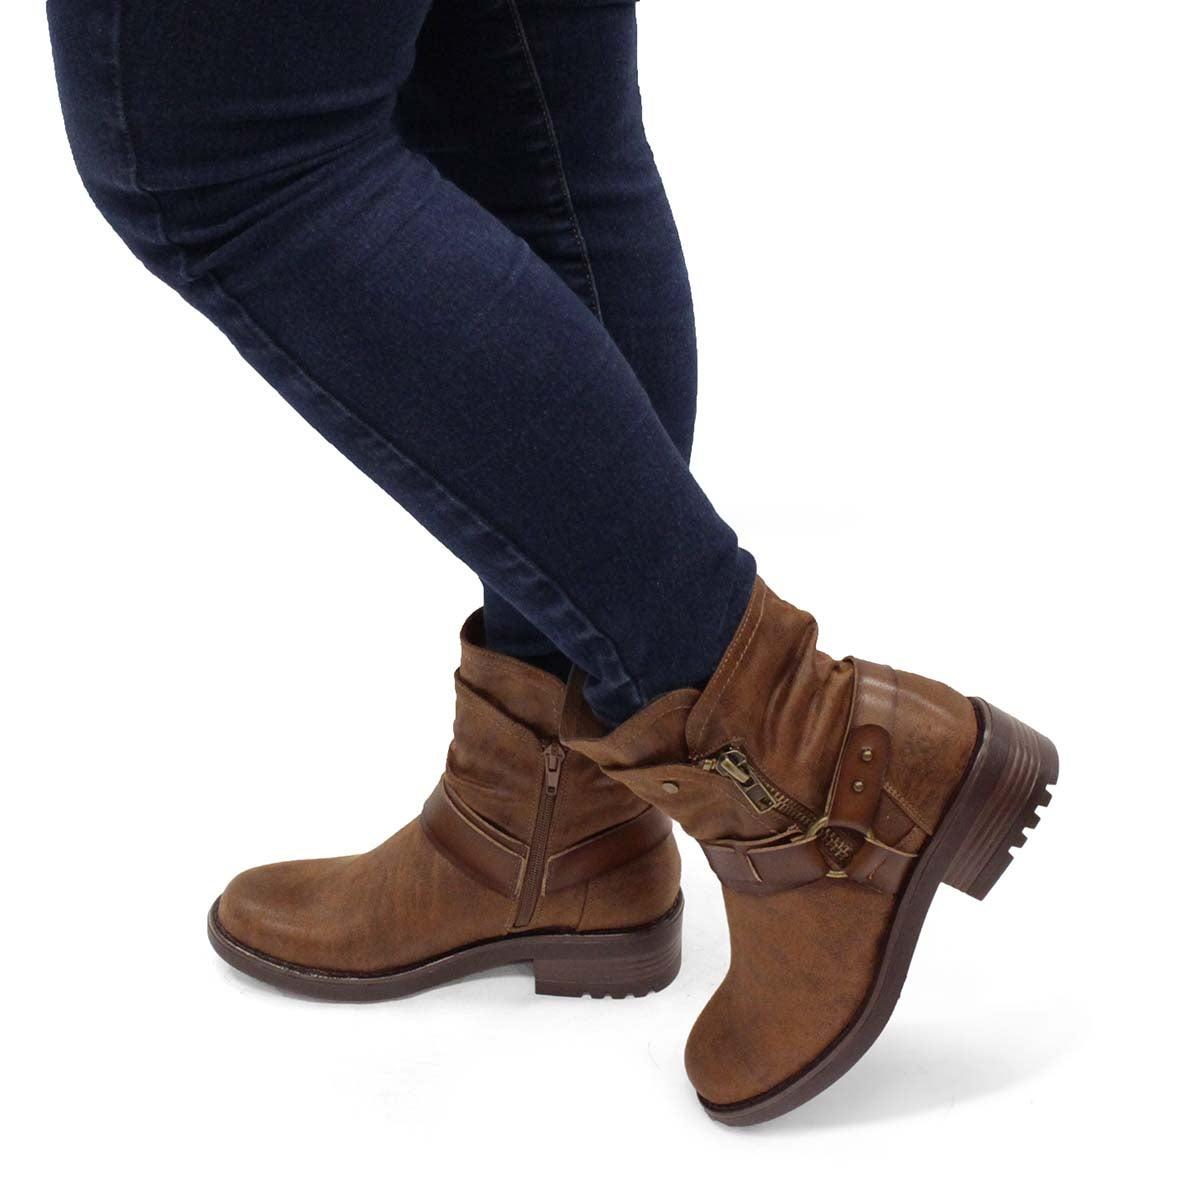 Women's TAMBI  tan slip on combat boots